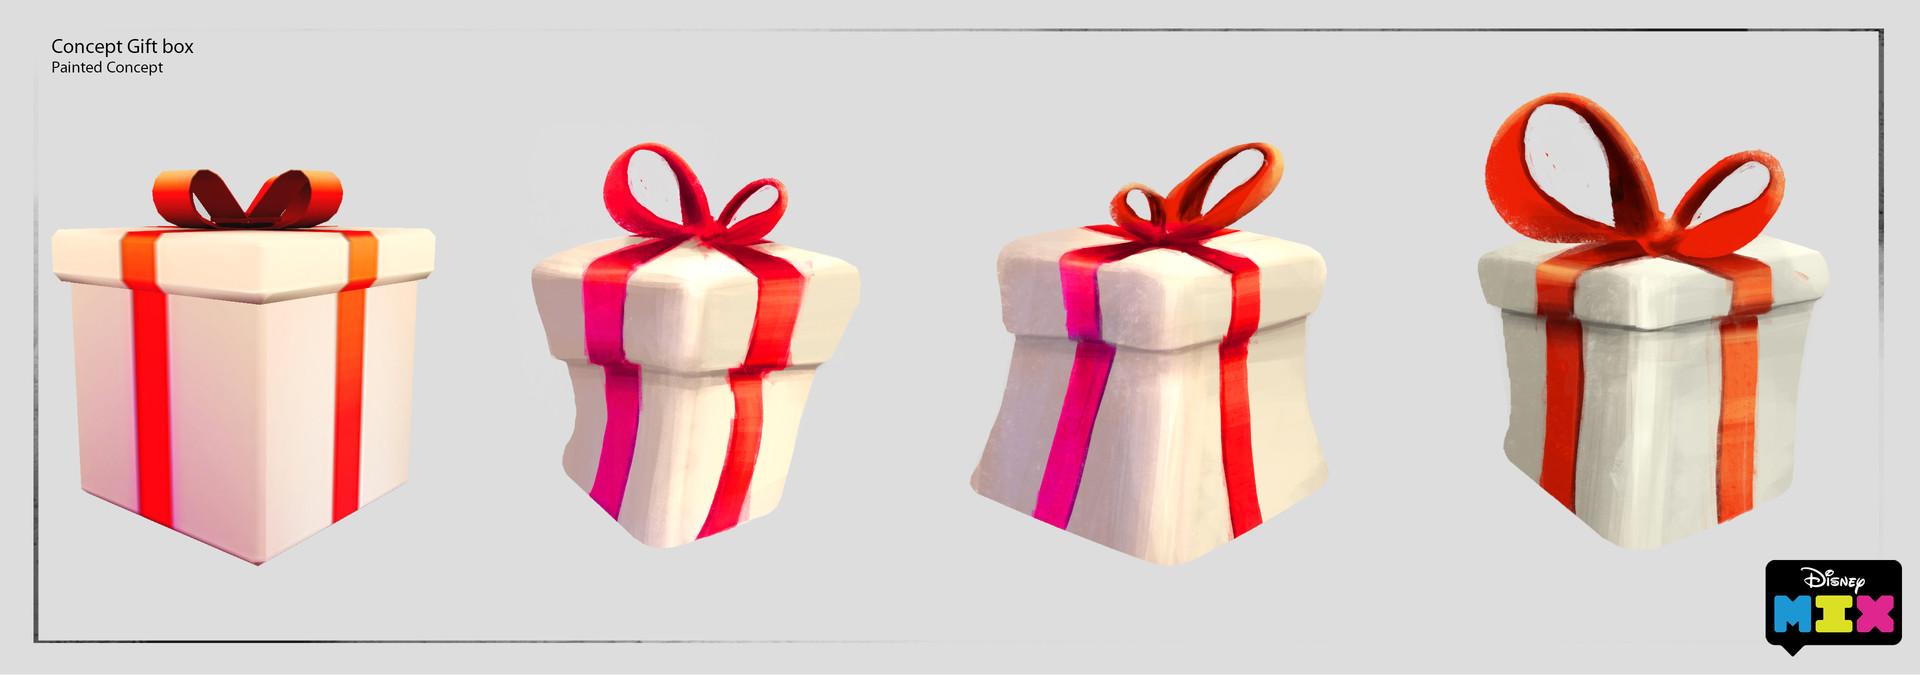 Elvis arevalo mix gift box concept